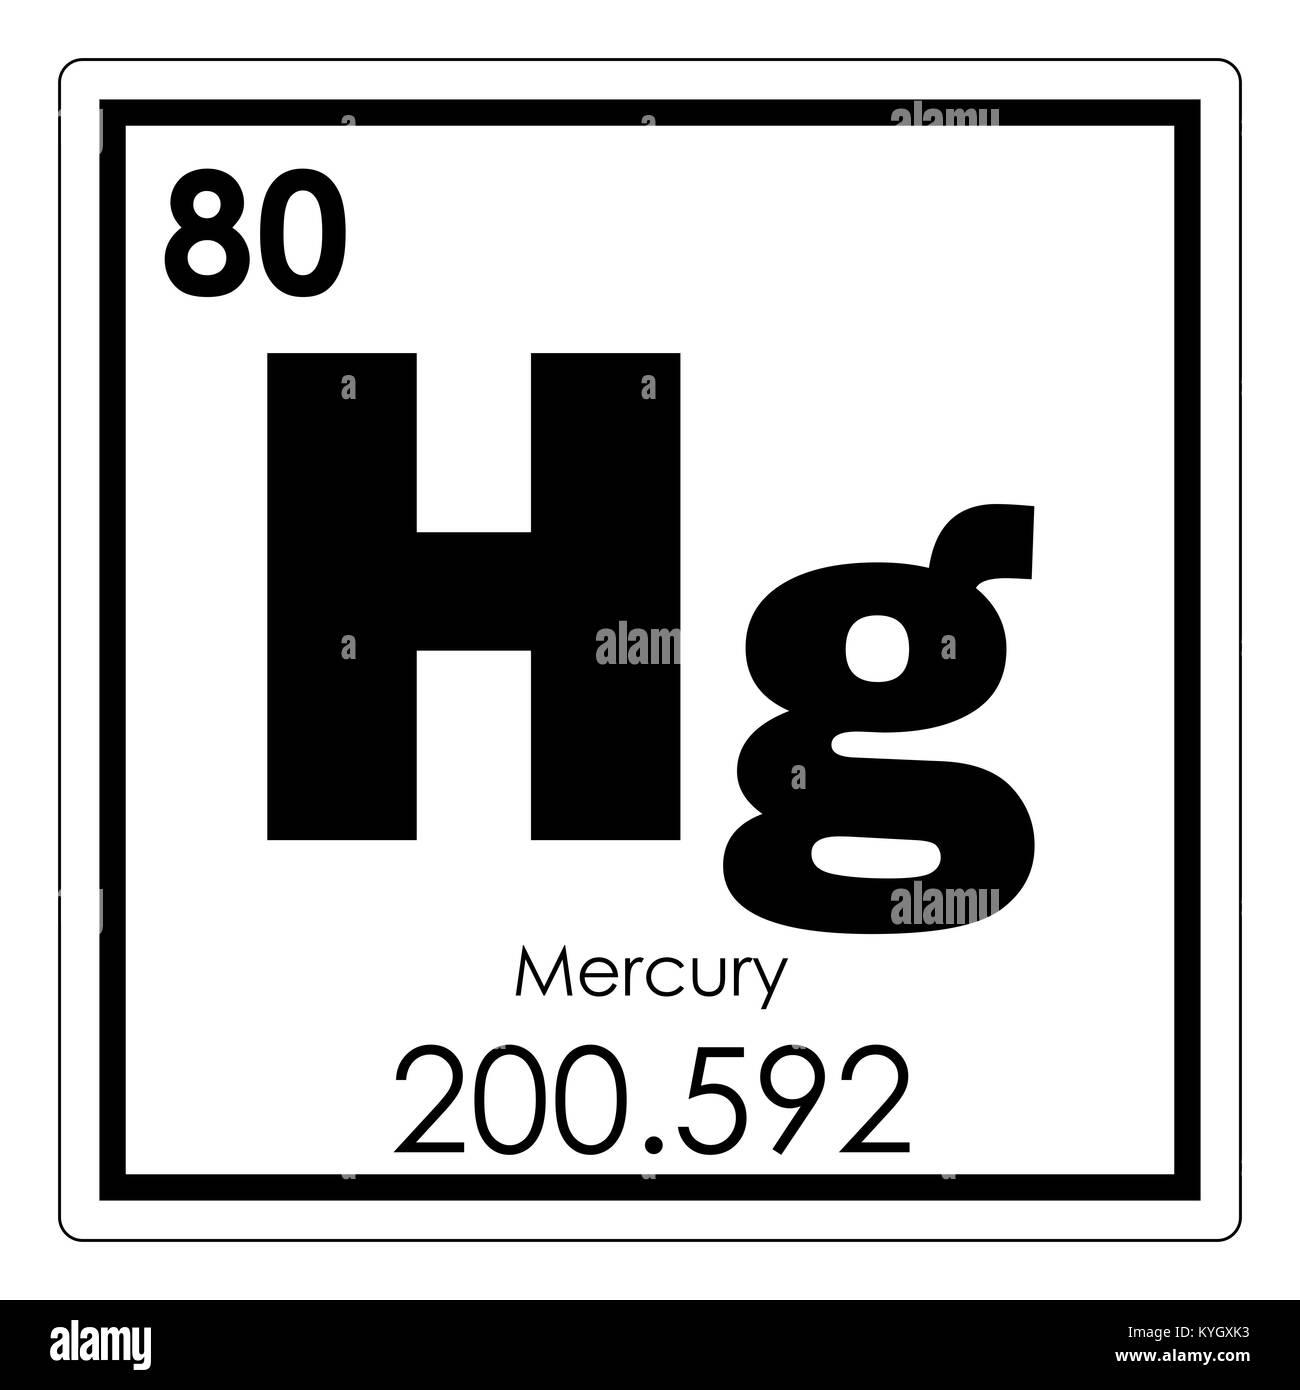 Tabla peridica de elementos qumicos mercurio smbolo de ciencia tabla peridica de elementos qumicos mercurio smbolo de ciencia urtaz Image collections